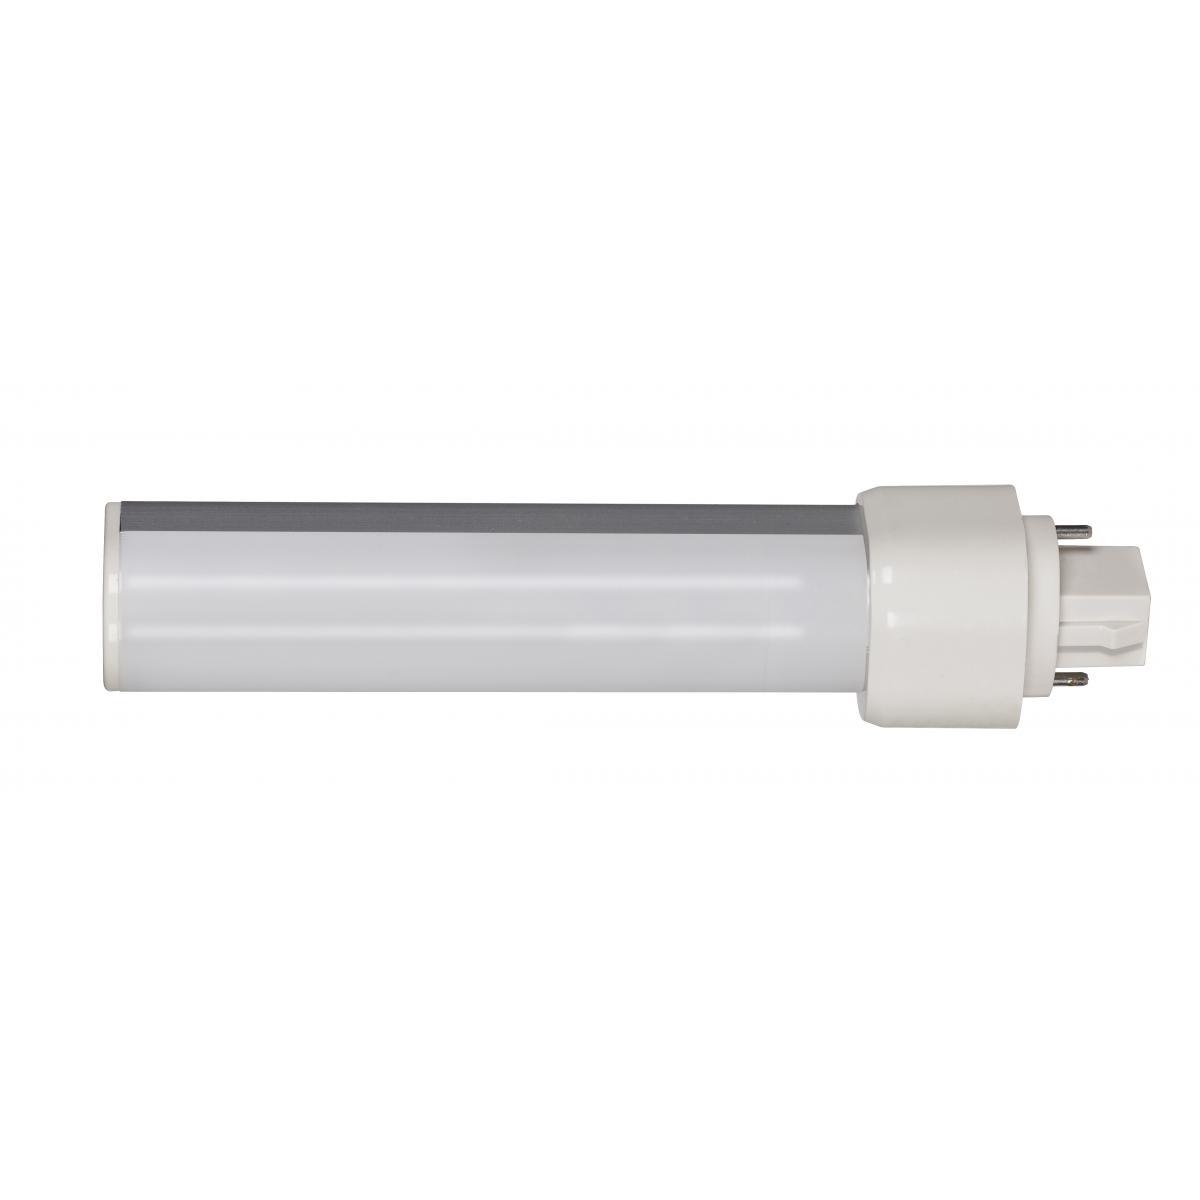 S8530 9WPLH/LED/827/BP/2P